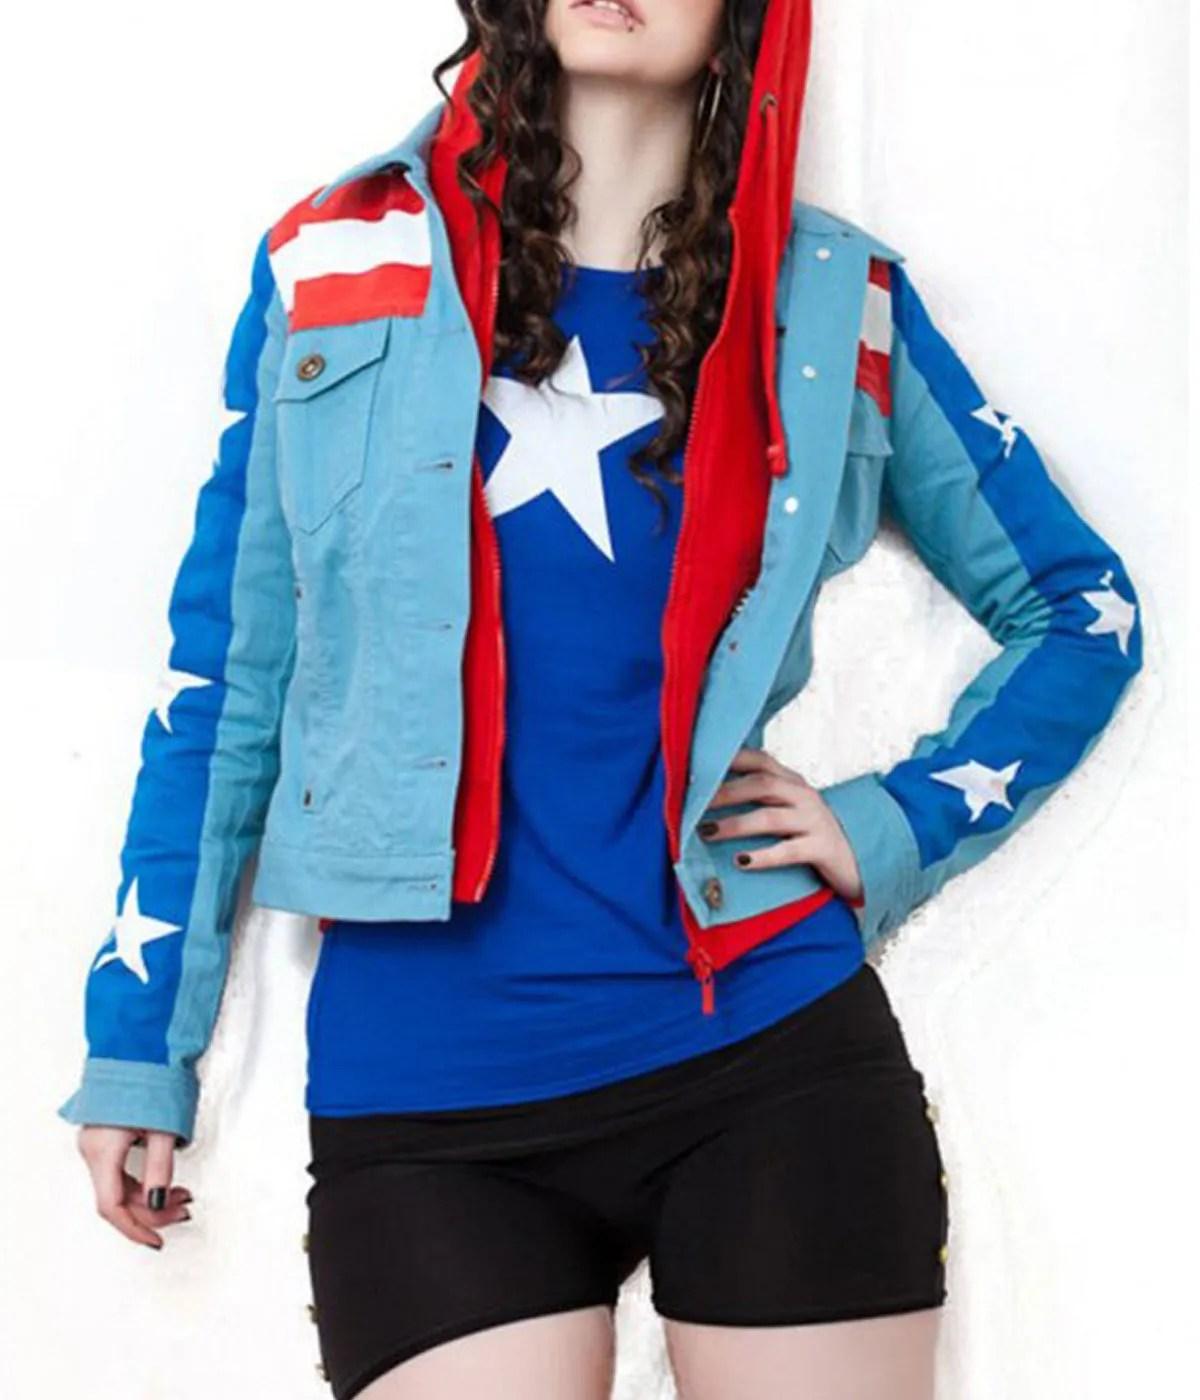 america-chavez-jacket